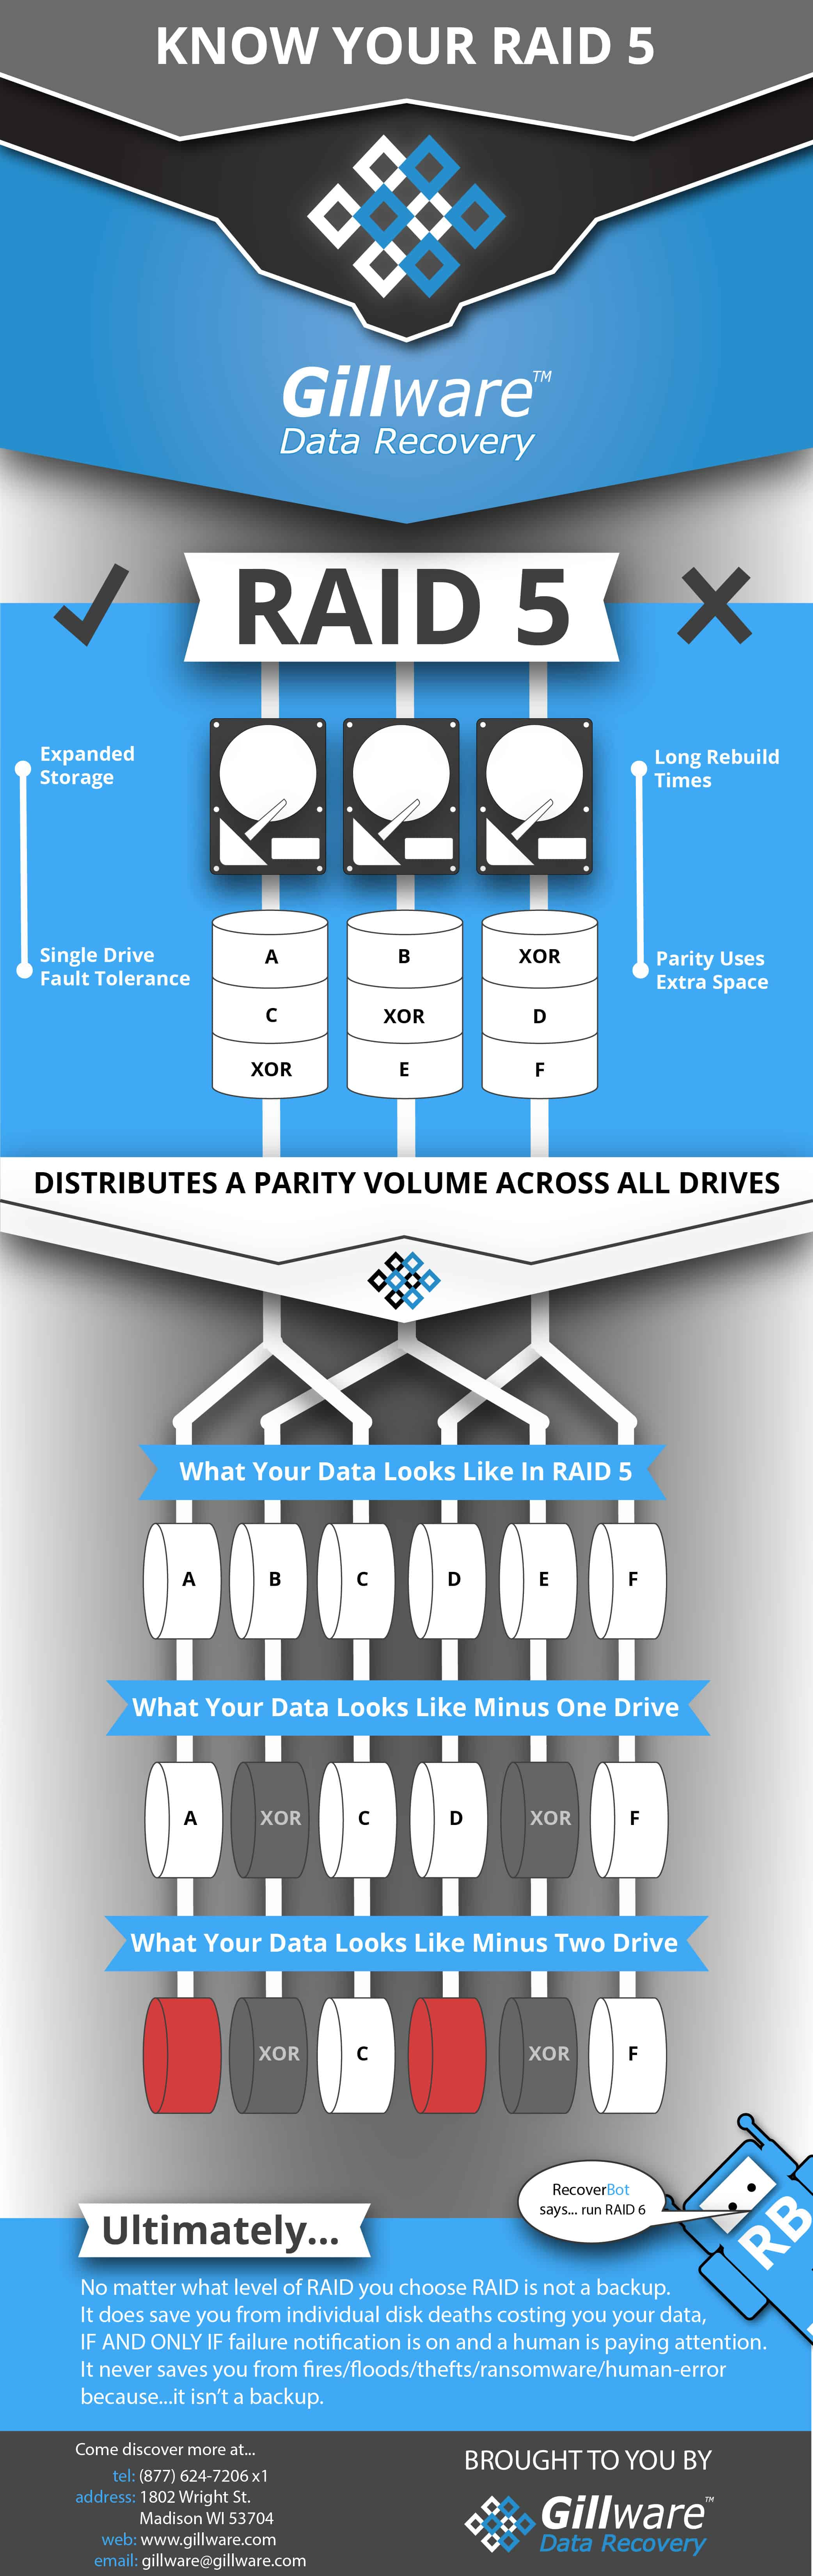 RAID 5 infographic